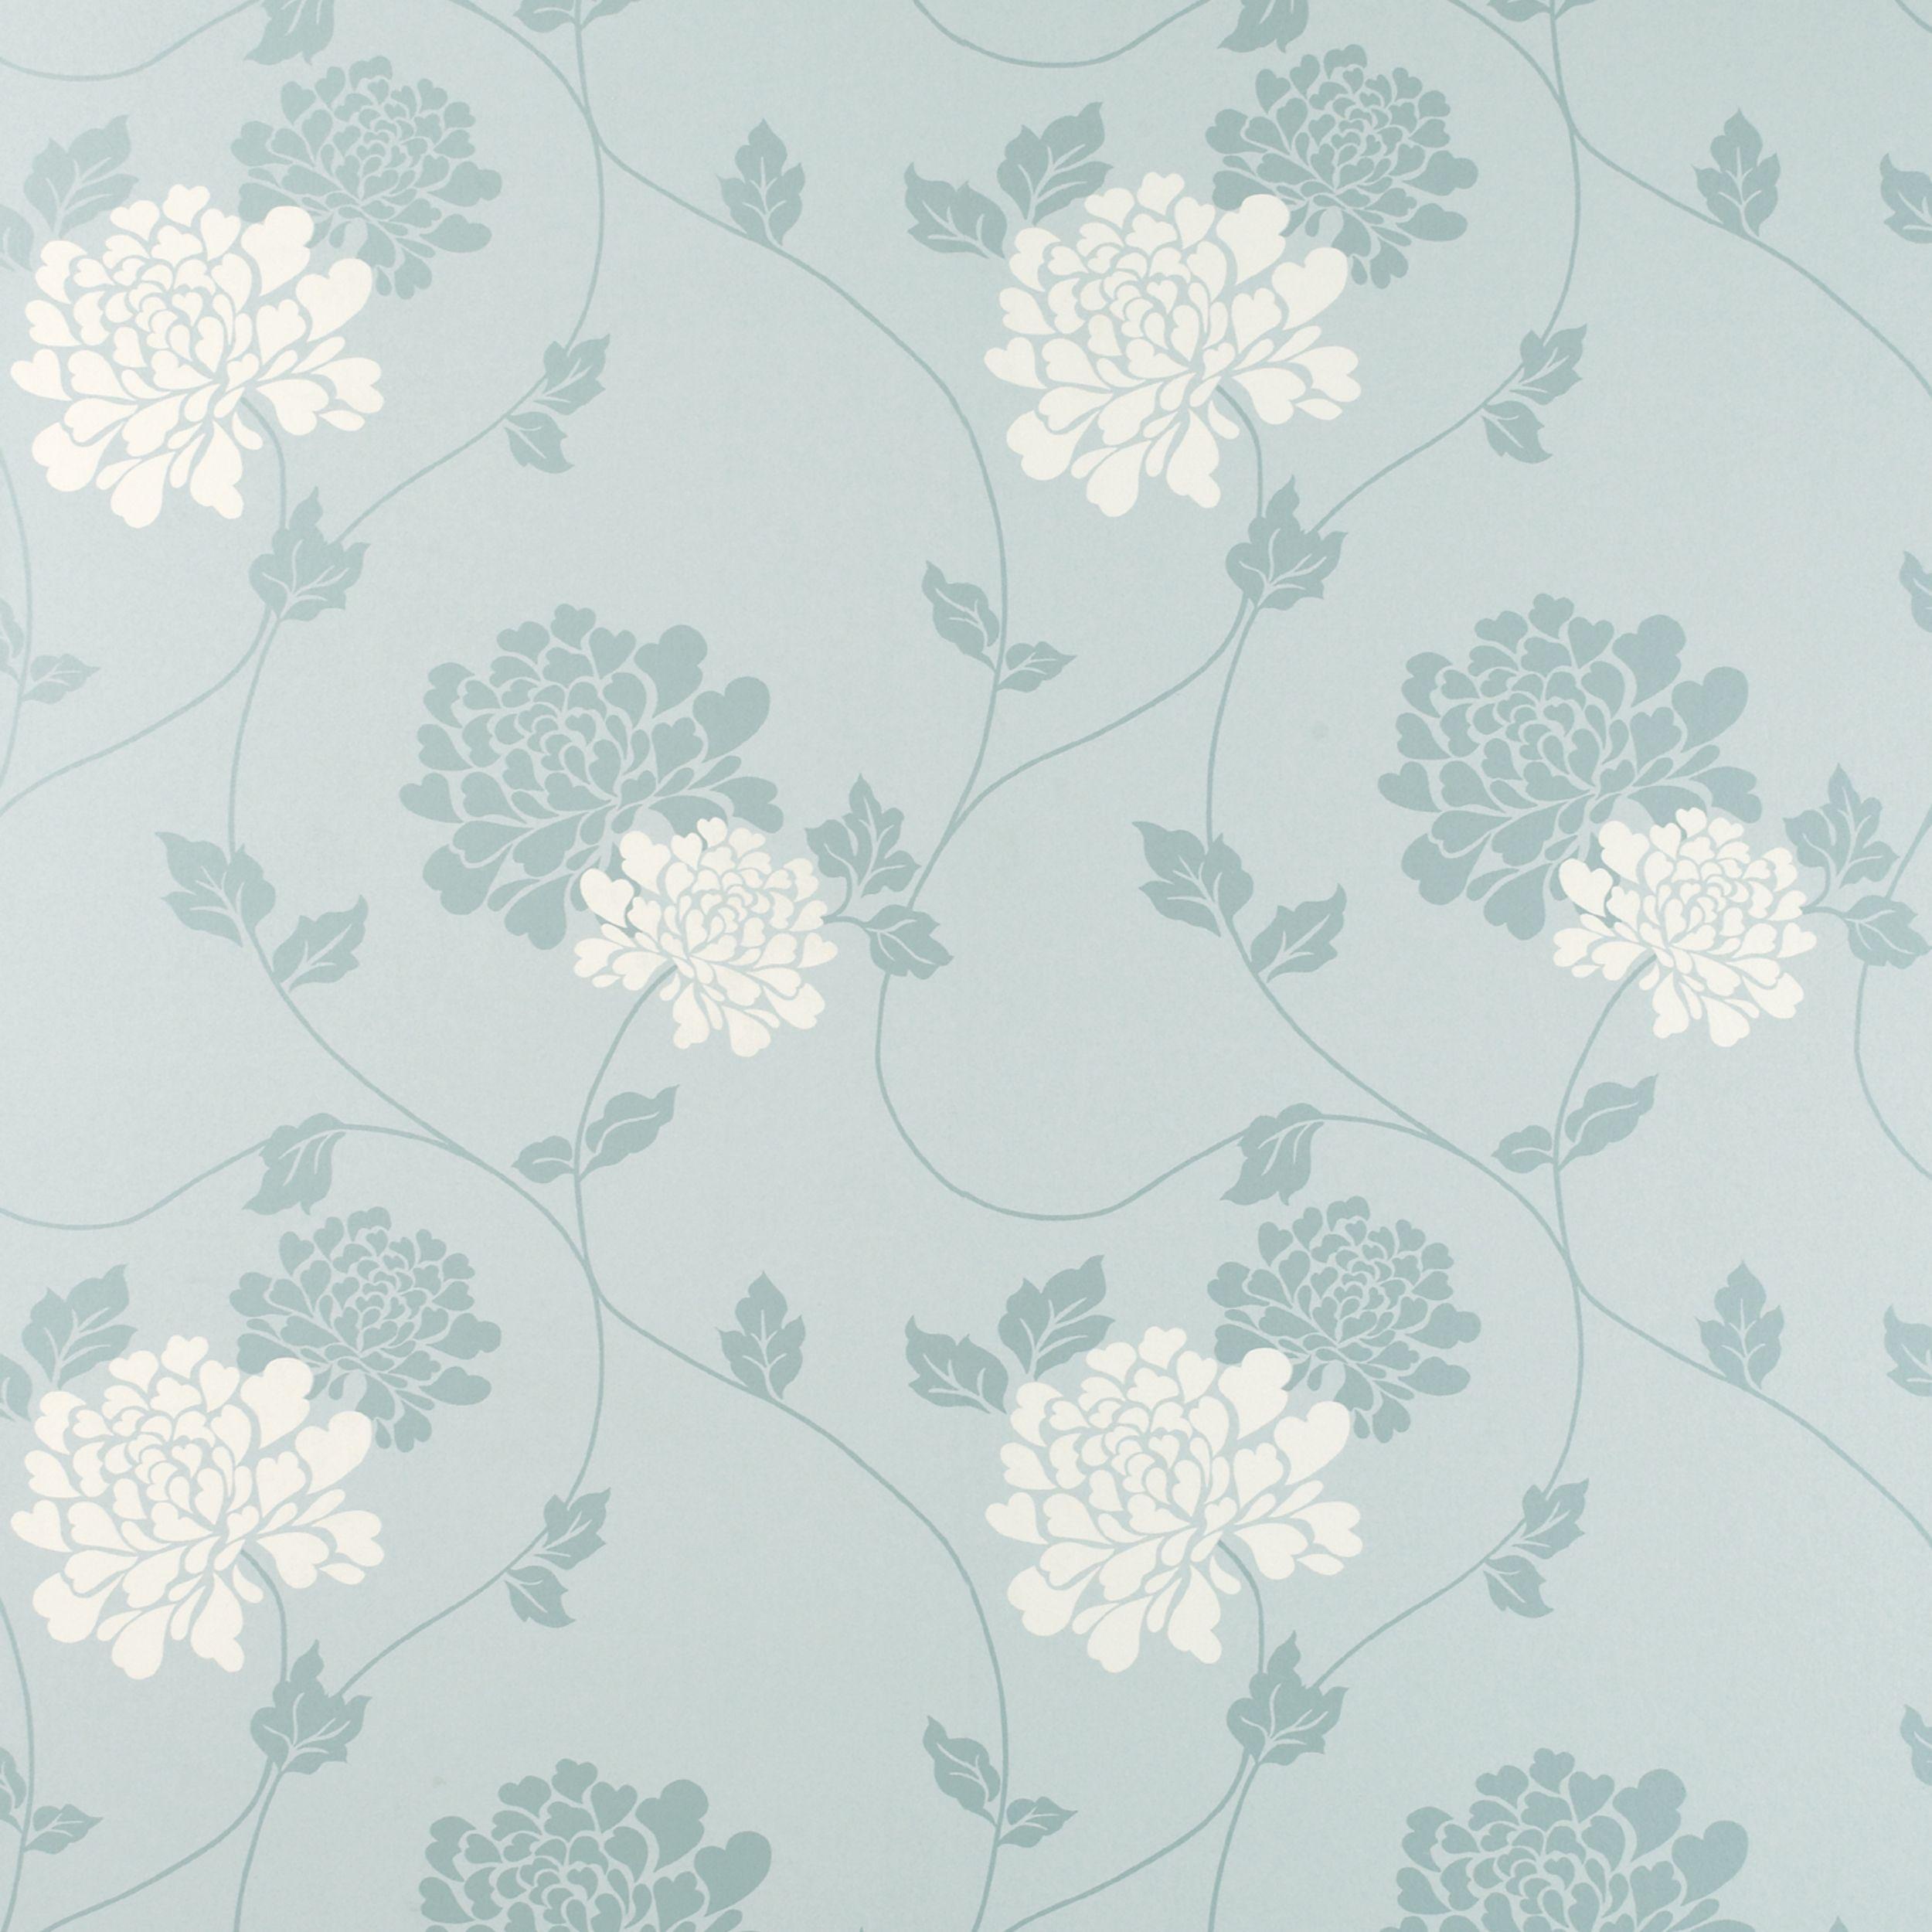 Pin by Esra Kalyon on flower PATTERN | Pinterest | Floral wallpapers ...